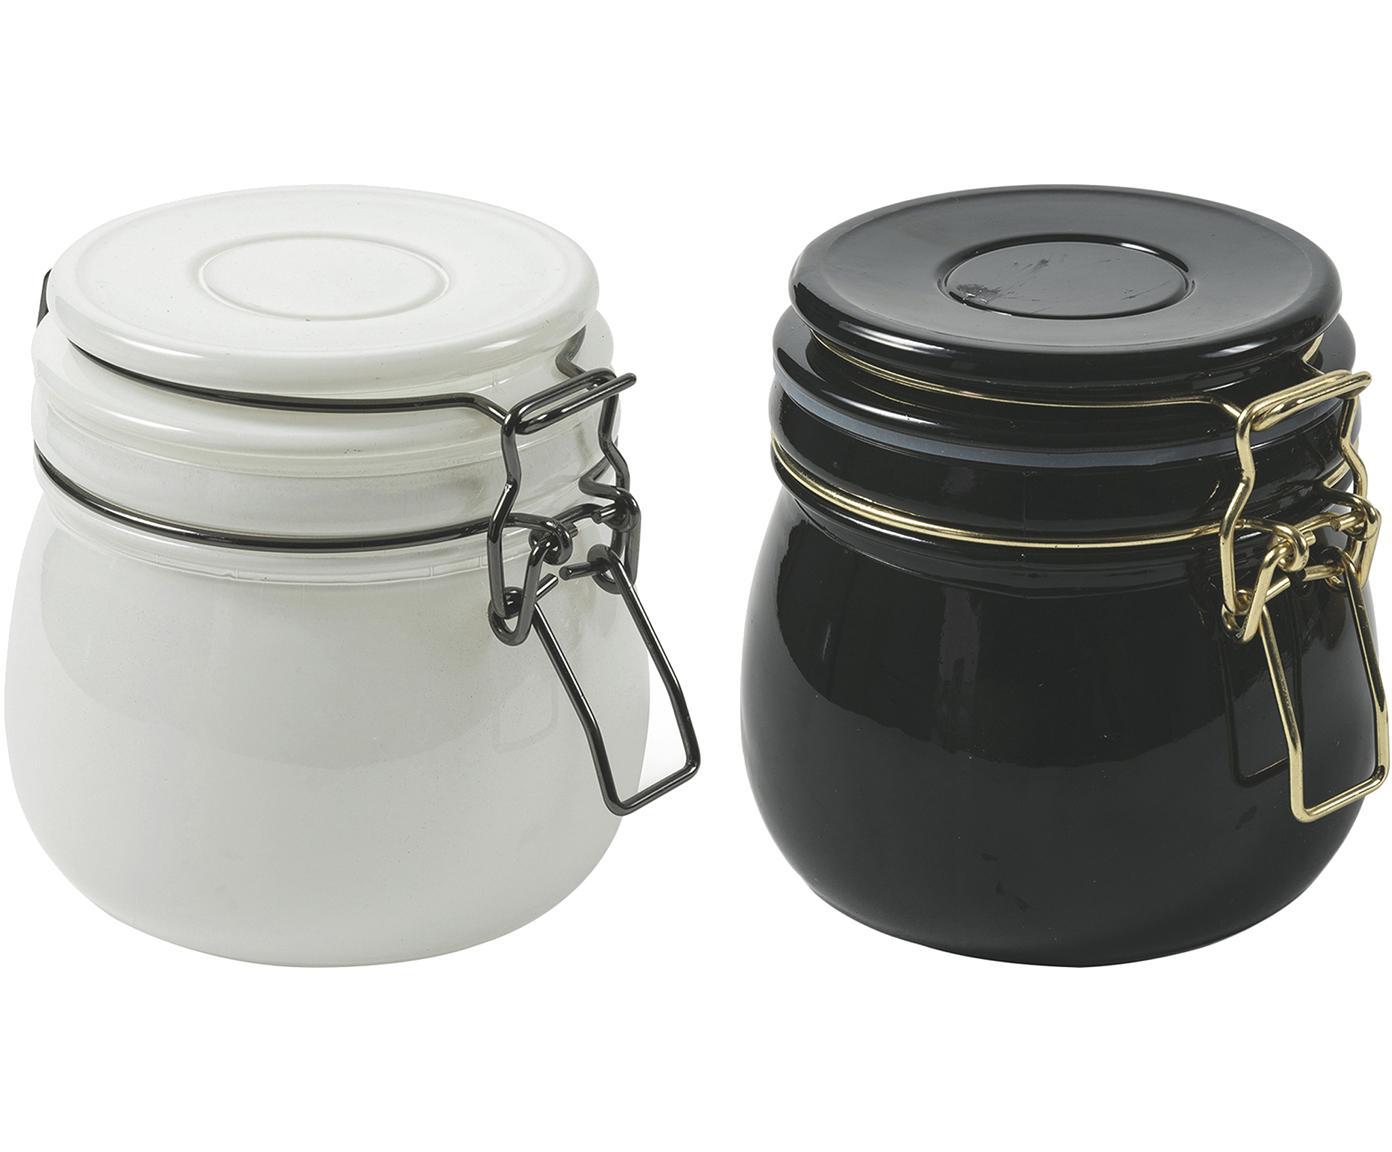 Set 2 contenitori Modern, Vetro, metallo, Bianco, nero, Ø 11 x Alt. 10 cm